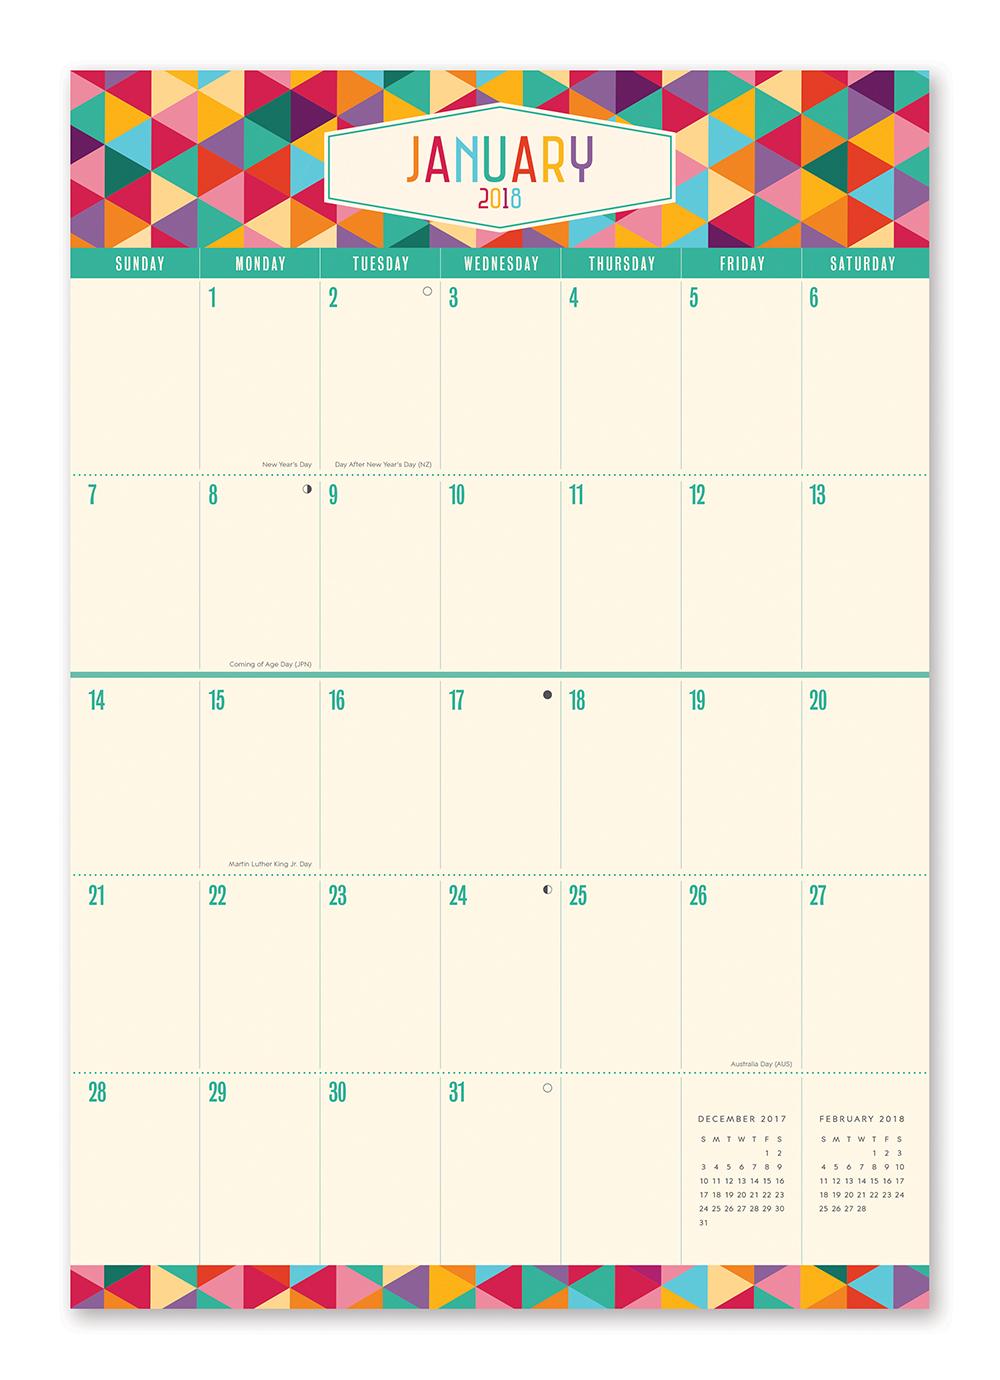 Kaleidoscope Do it All Wall Calendar 2018 by Orange Circle Studio inside 9781682581865